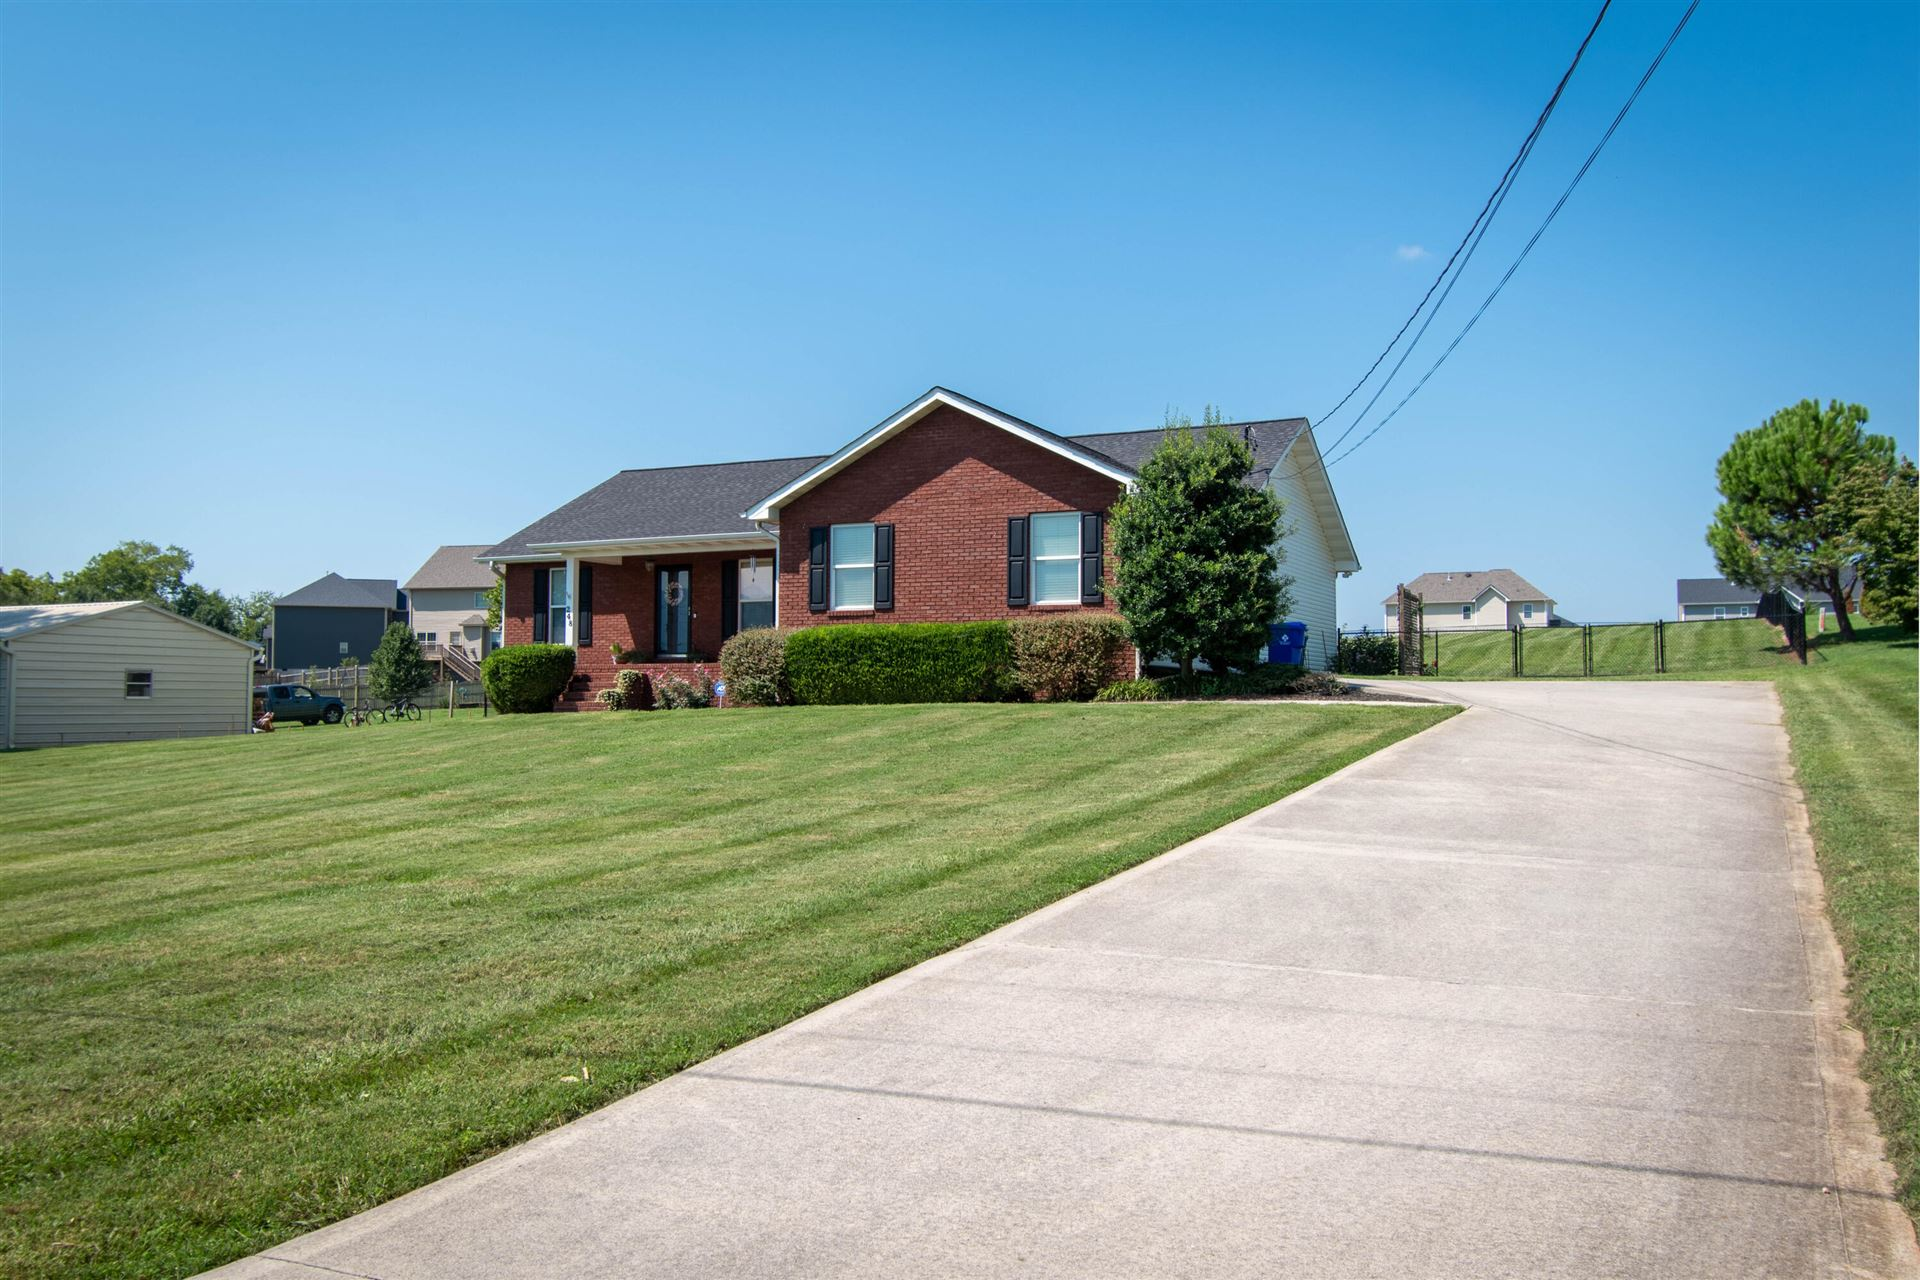 Photo of 248 Chapman Overlook Drive, Seymour, TN 37865 (MLS # 1165565)